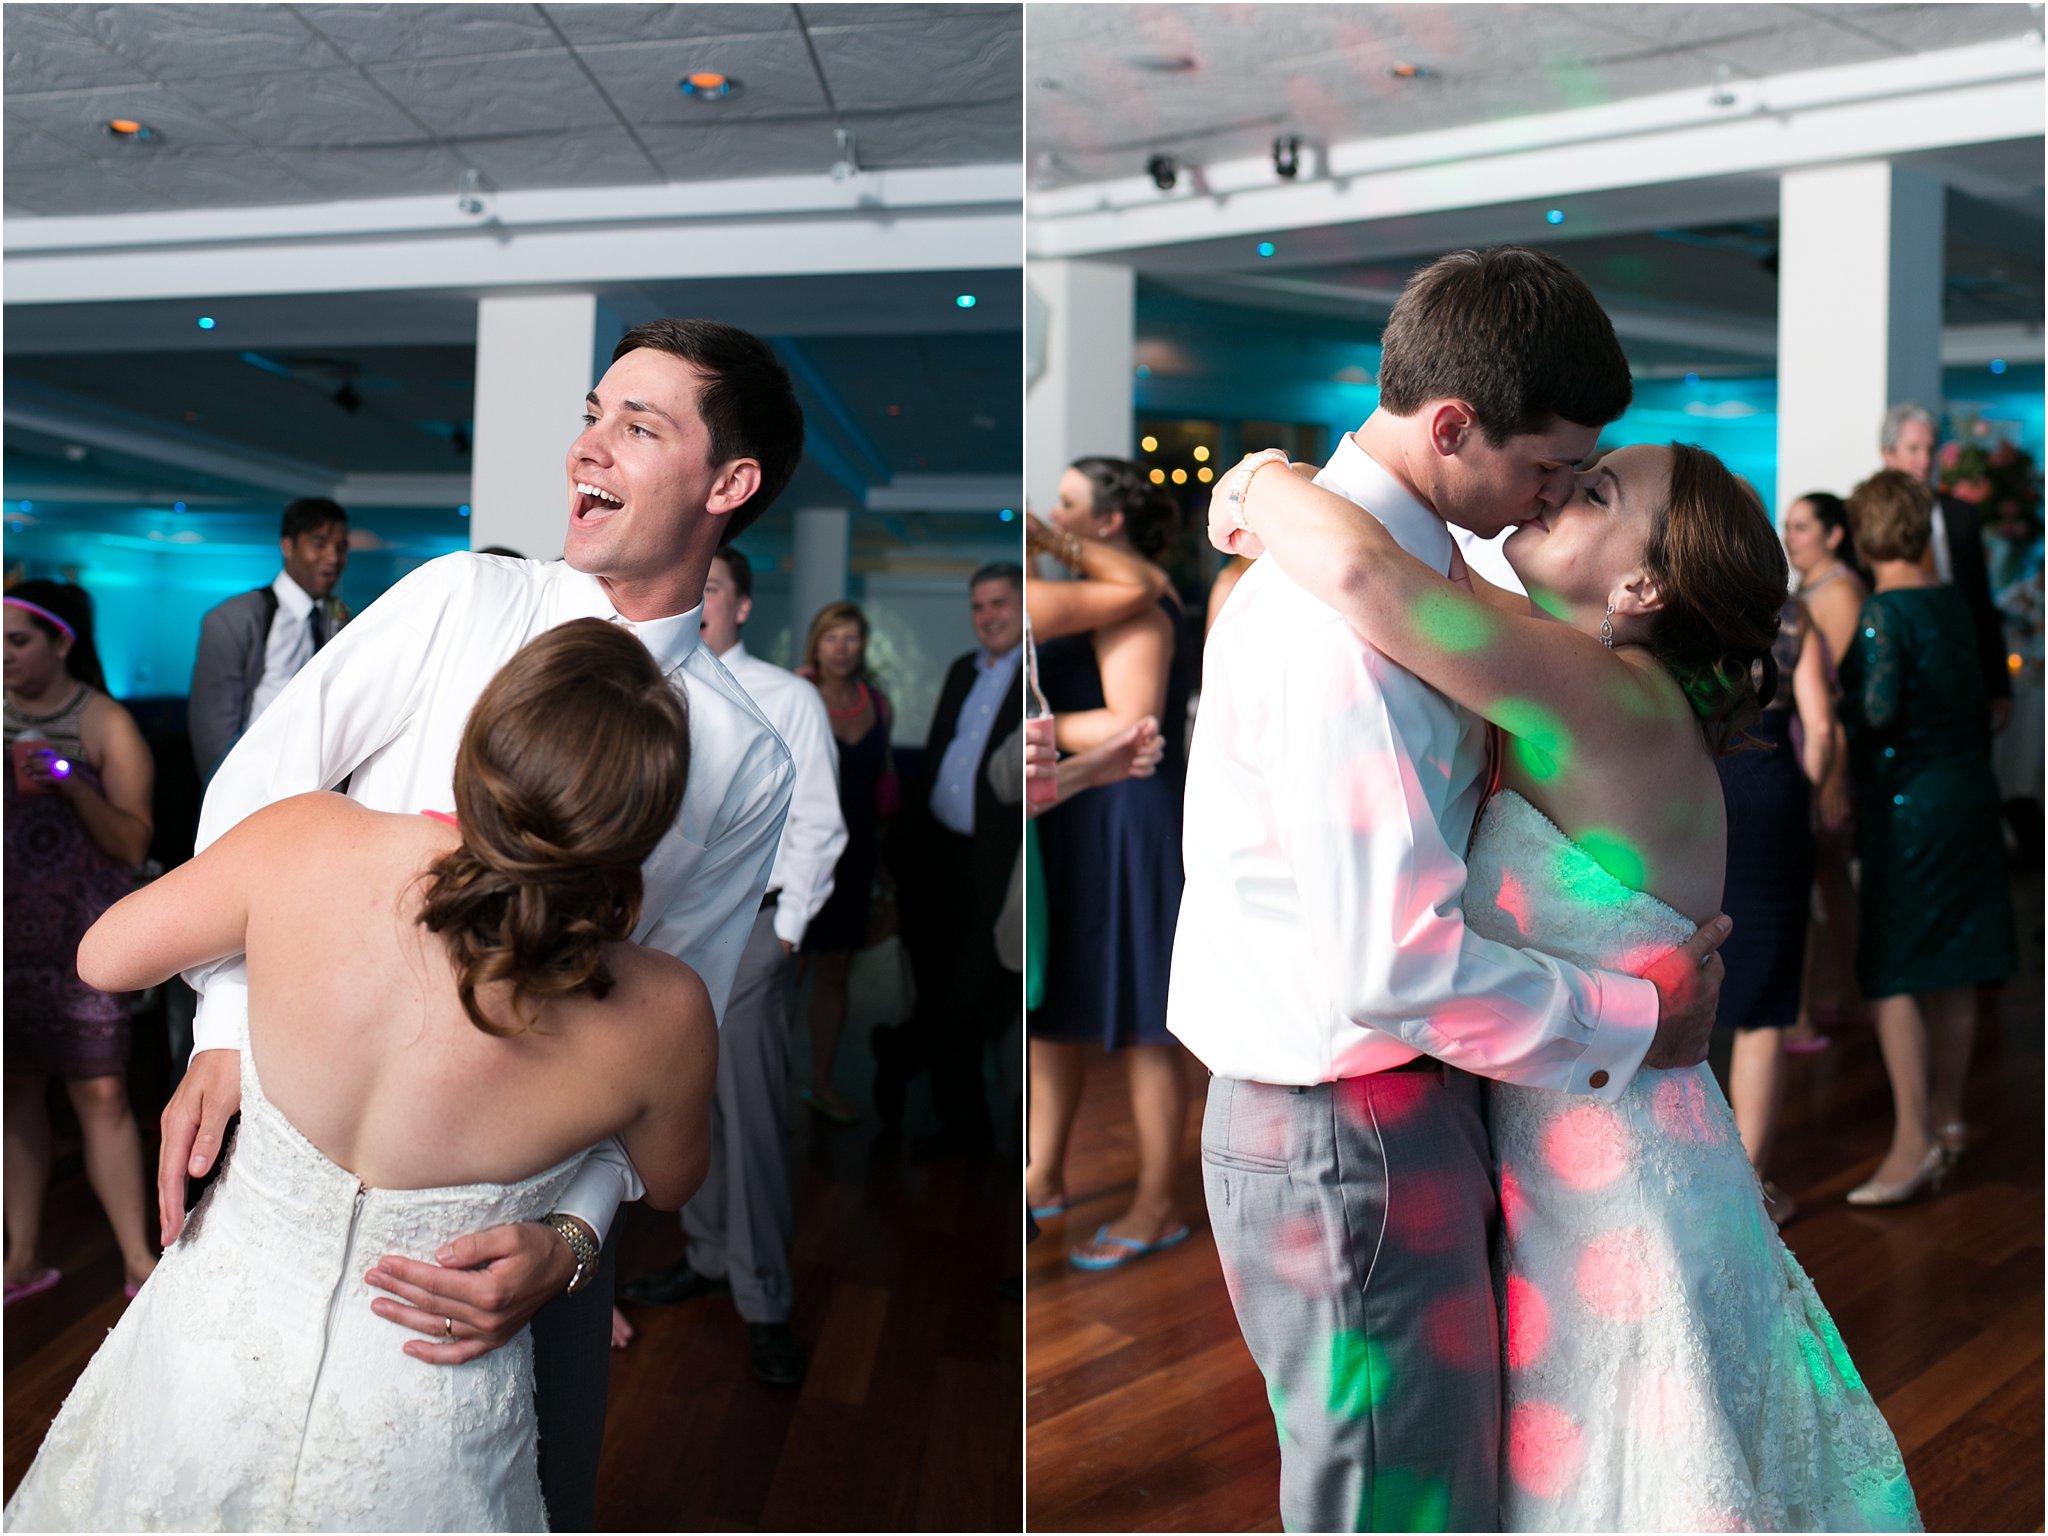 jessica_ryan_photography_wedding_photography_virginiabeach_virginia_candid_authentic_wedding_portraits_marina_shores_yacht_club_chesapeake_bay_1971